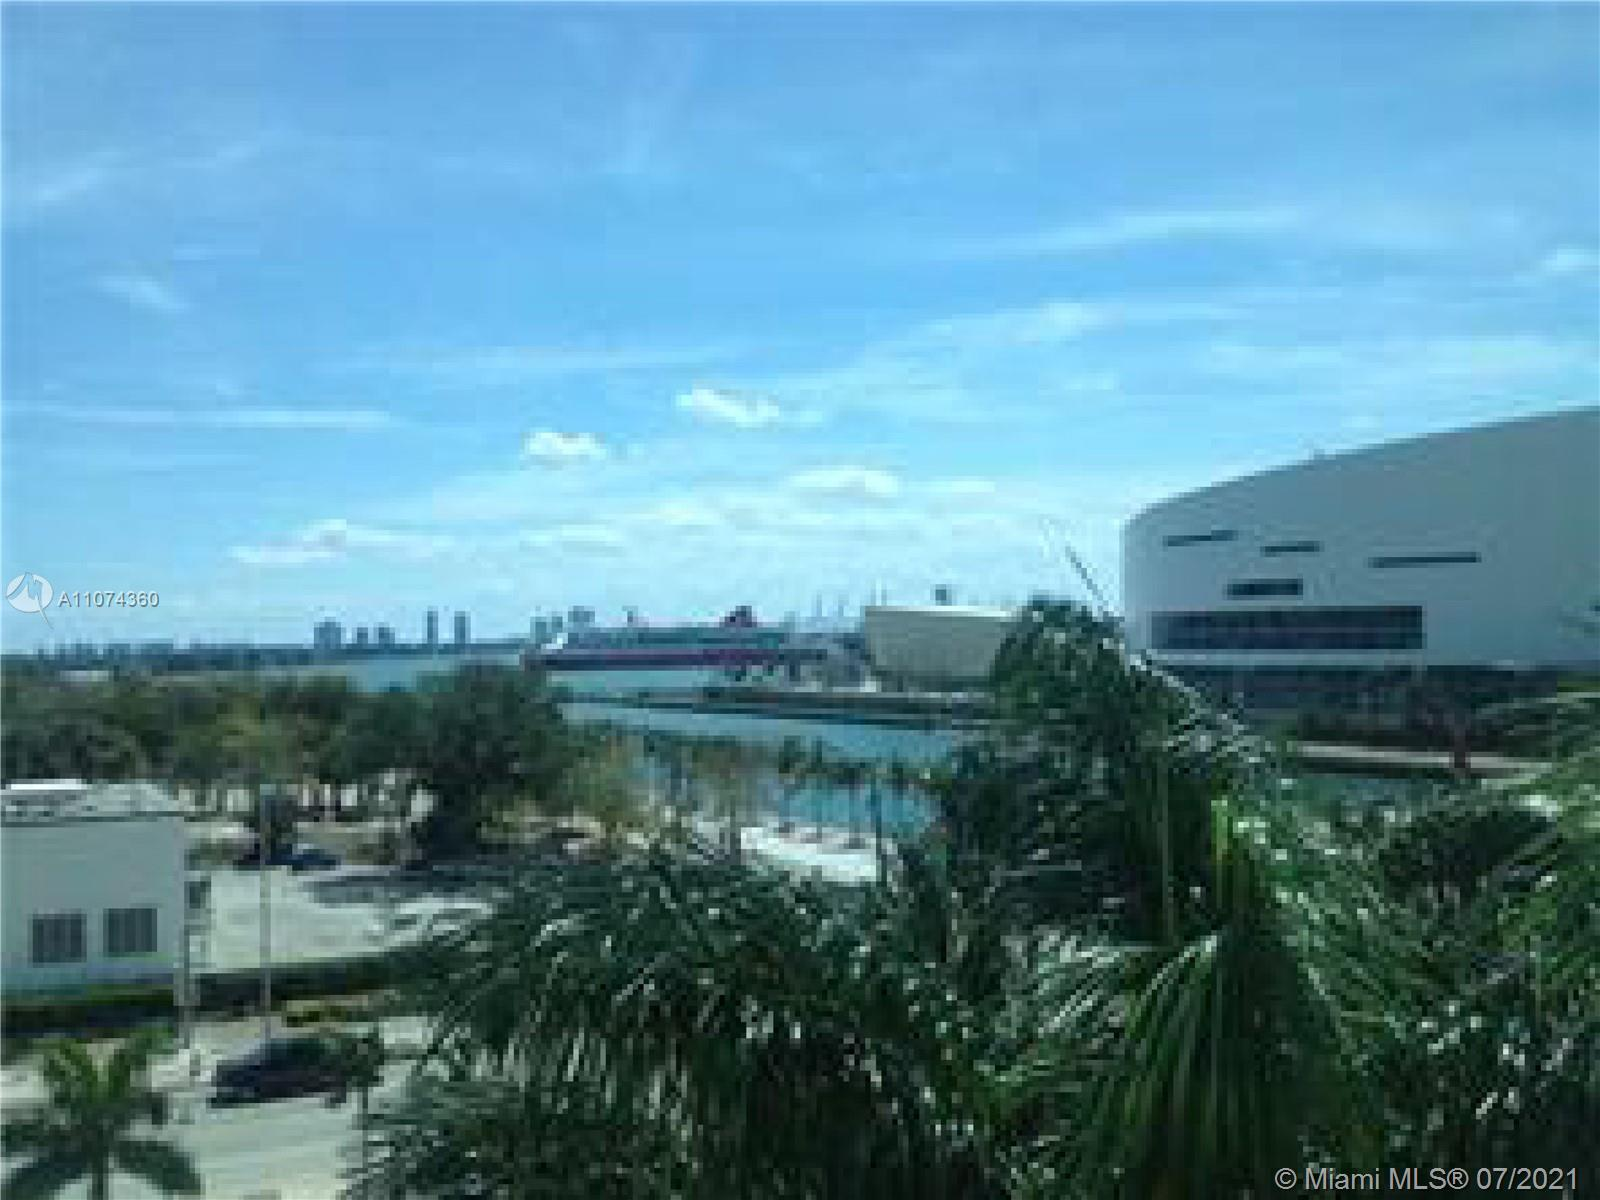 900 Biscayne Bay #O-601 - 900 Biscayne Blvd #O-601, Miami, FL 33132